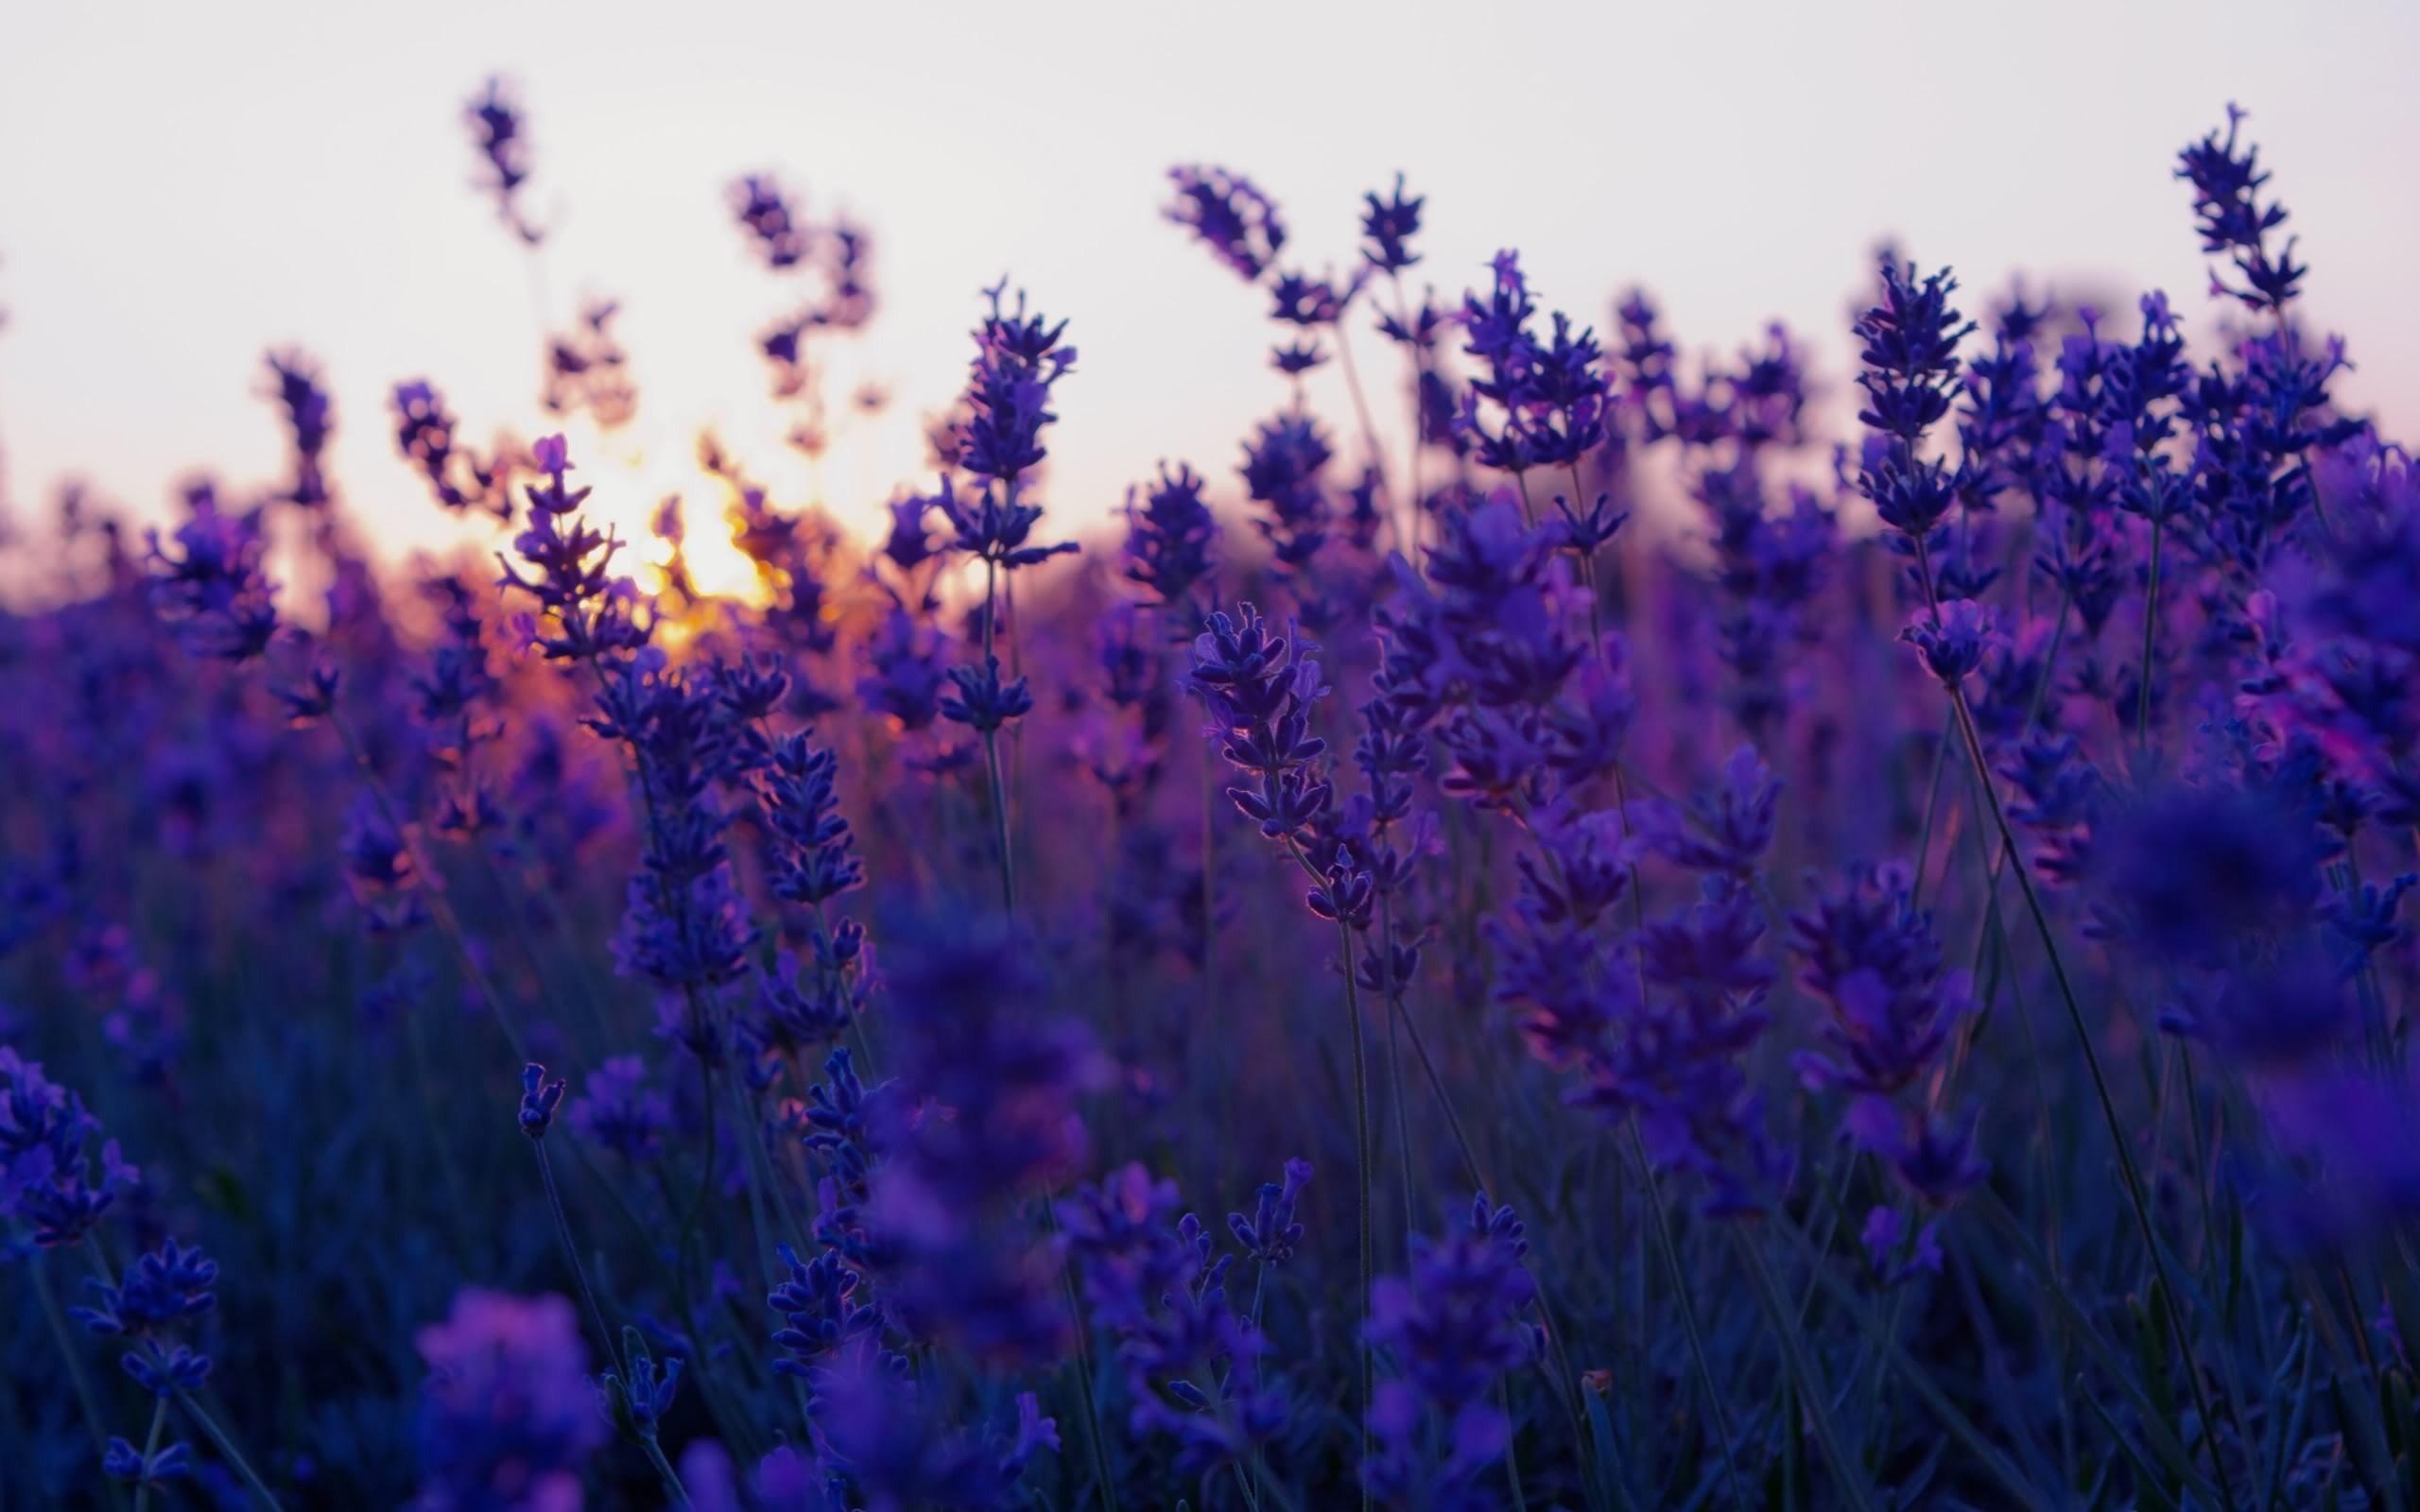 Lavender Wallpaper – A Decorative Wallpaper